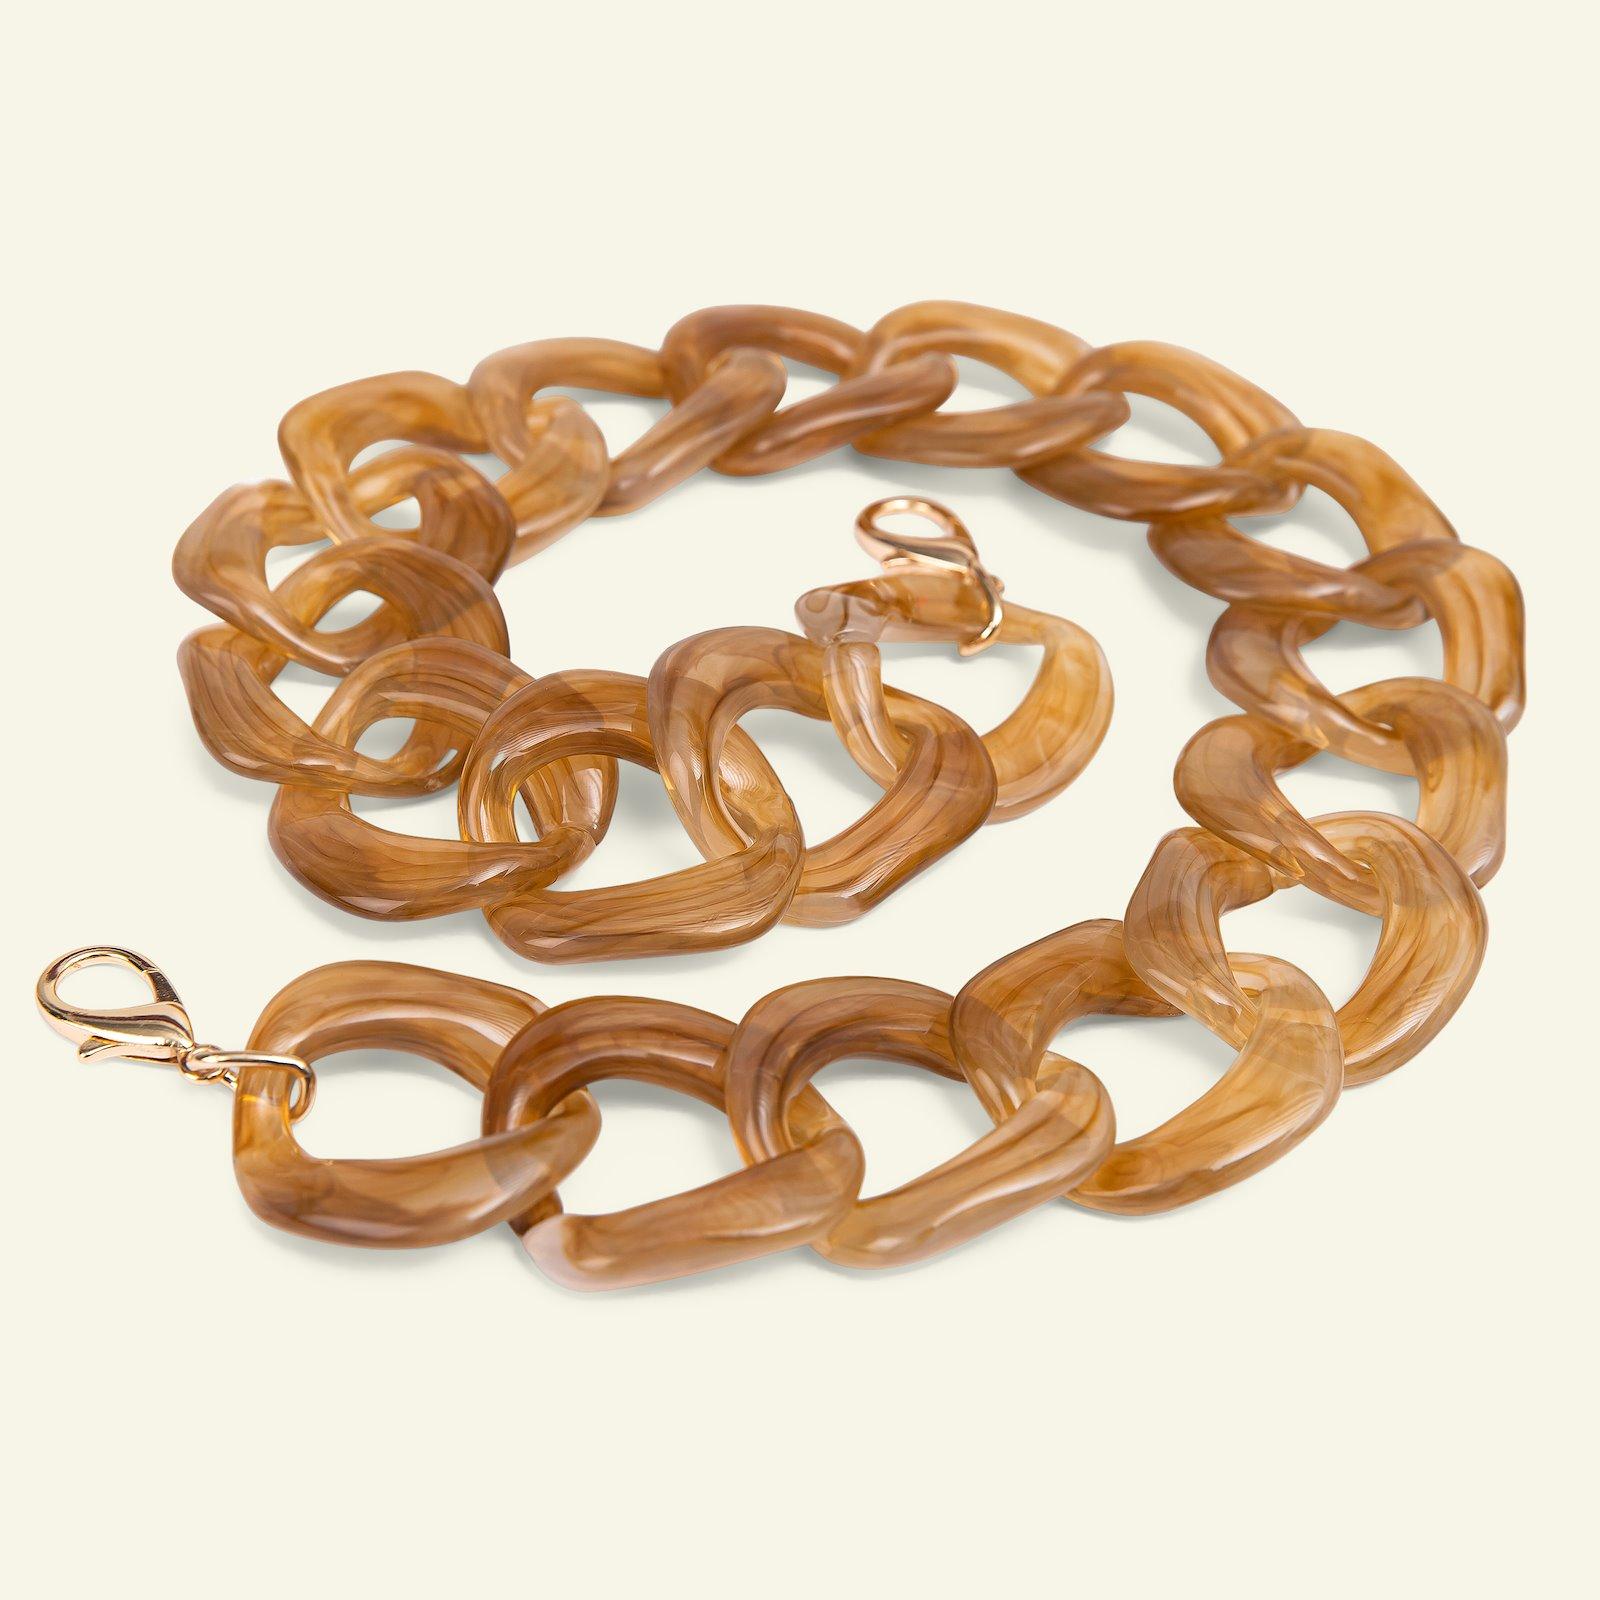 Chain handle 53cm caramel 1pc 46302_pack